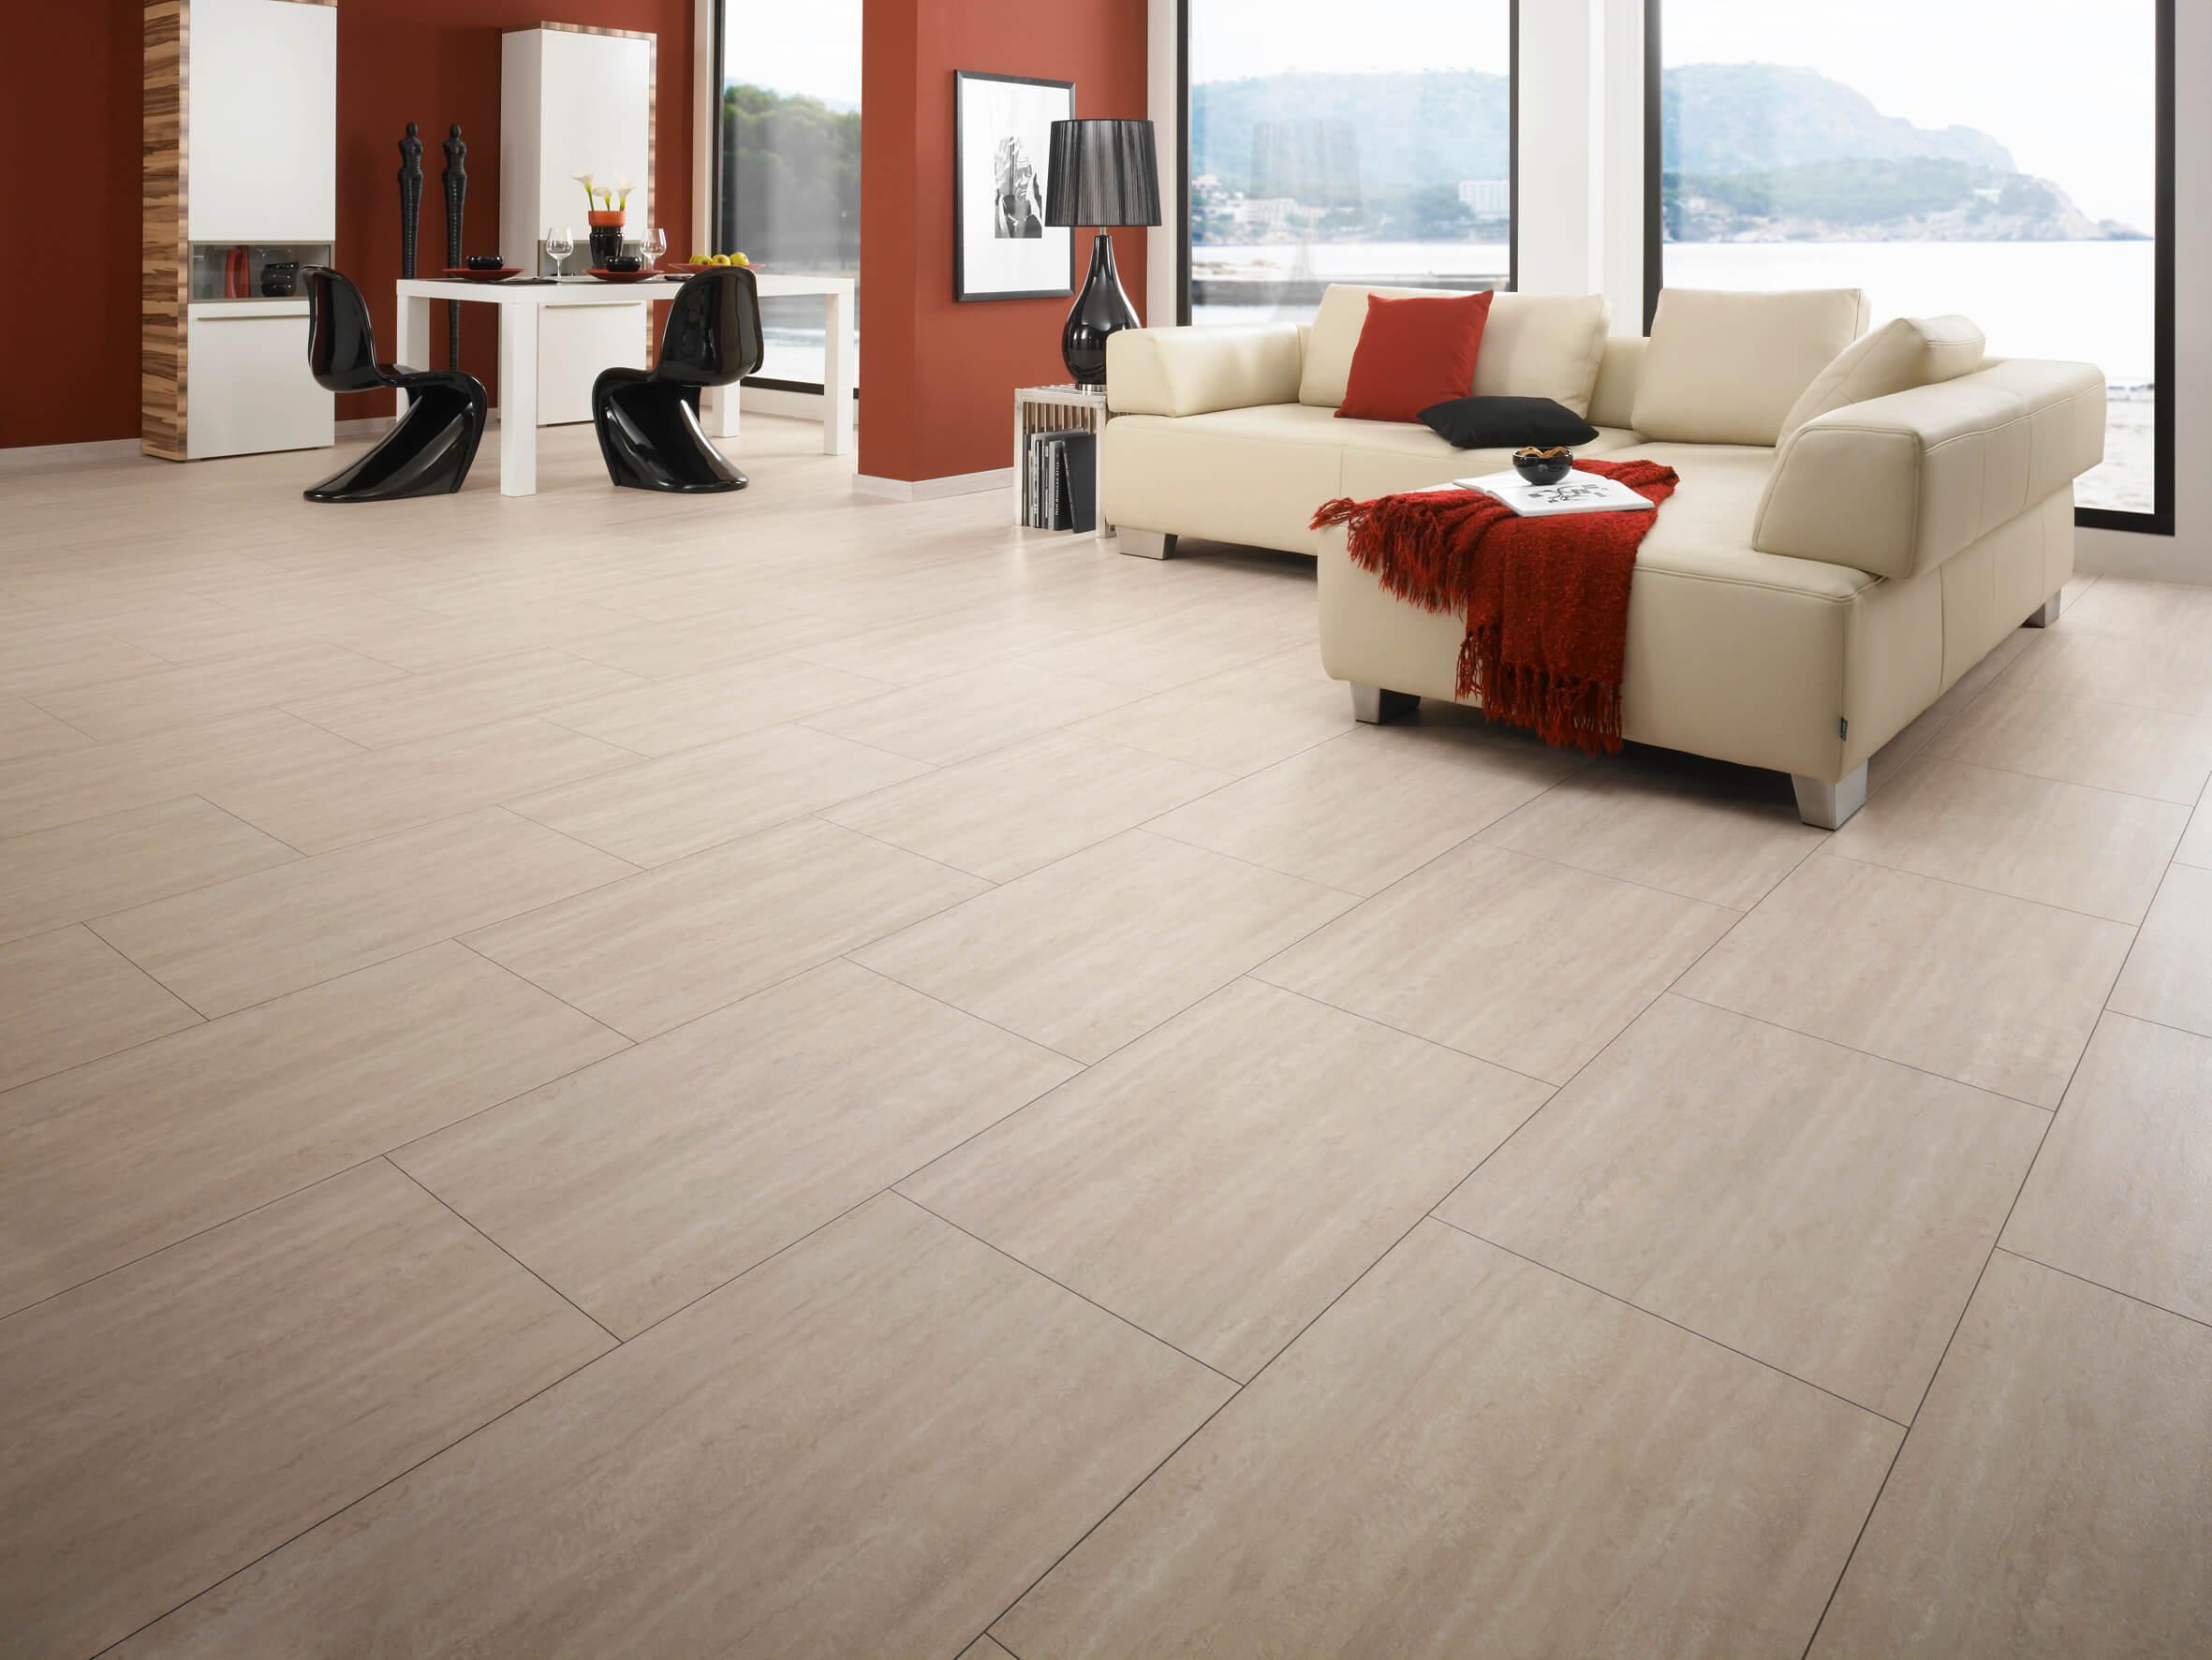 schiefer bianco antigua infinity kwg vinylboden 10 8 mm. Black Bedroom Furniture Sets. Home Design Ideas